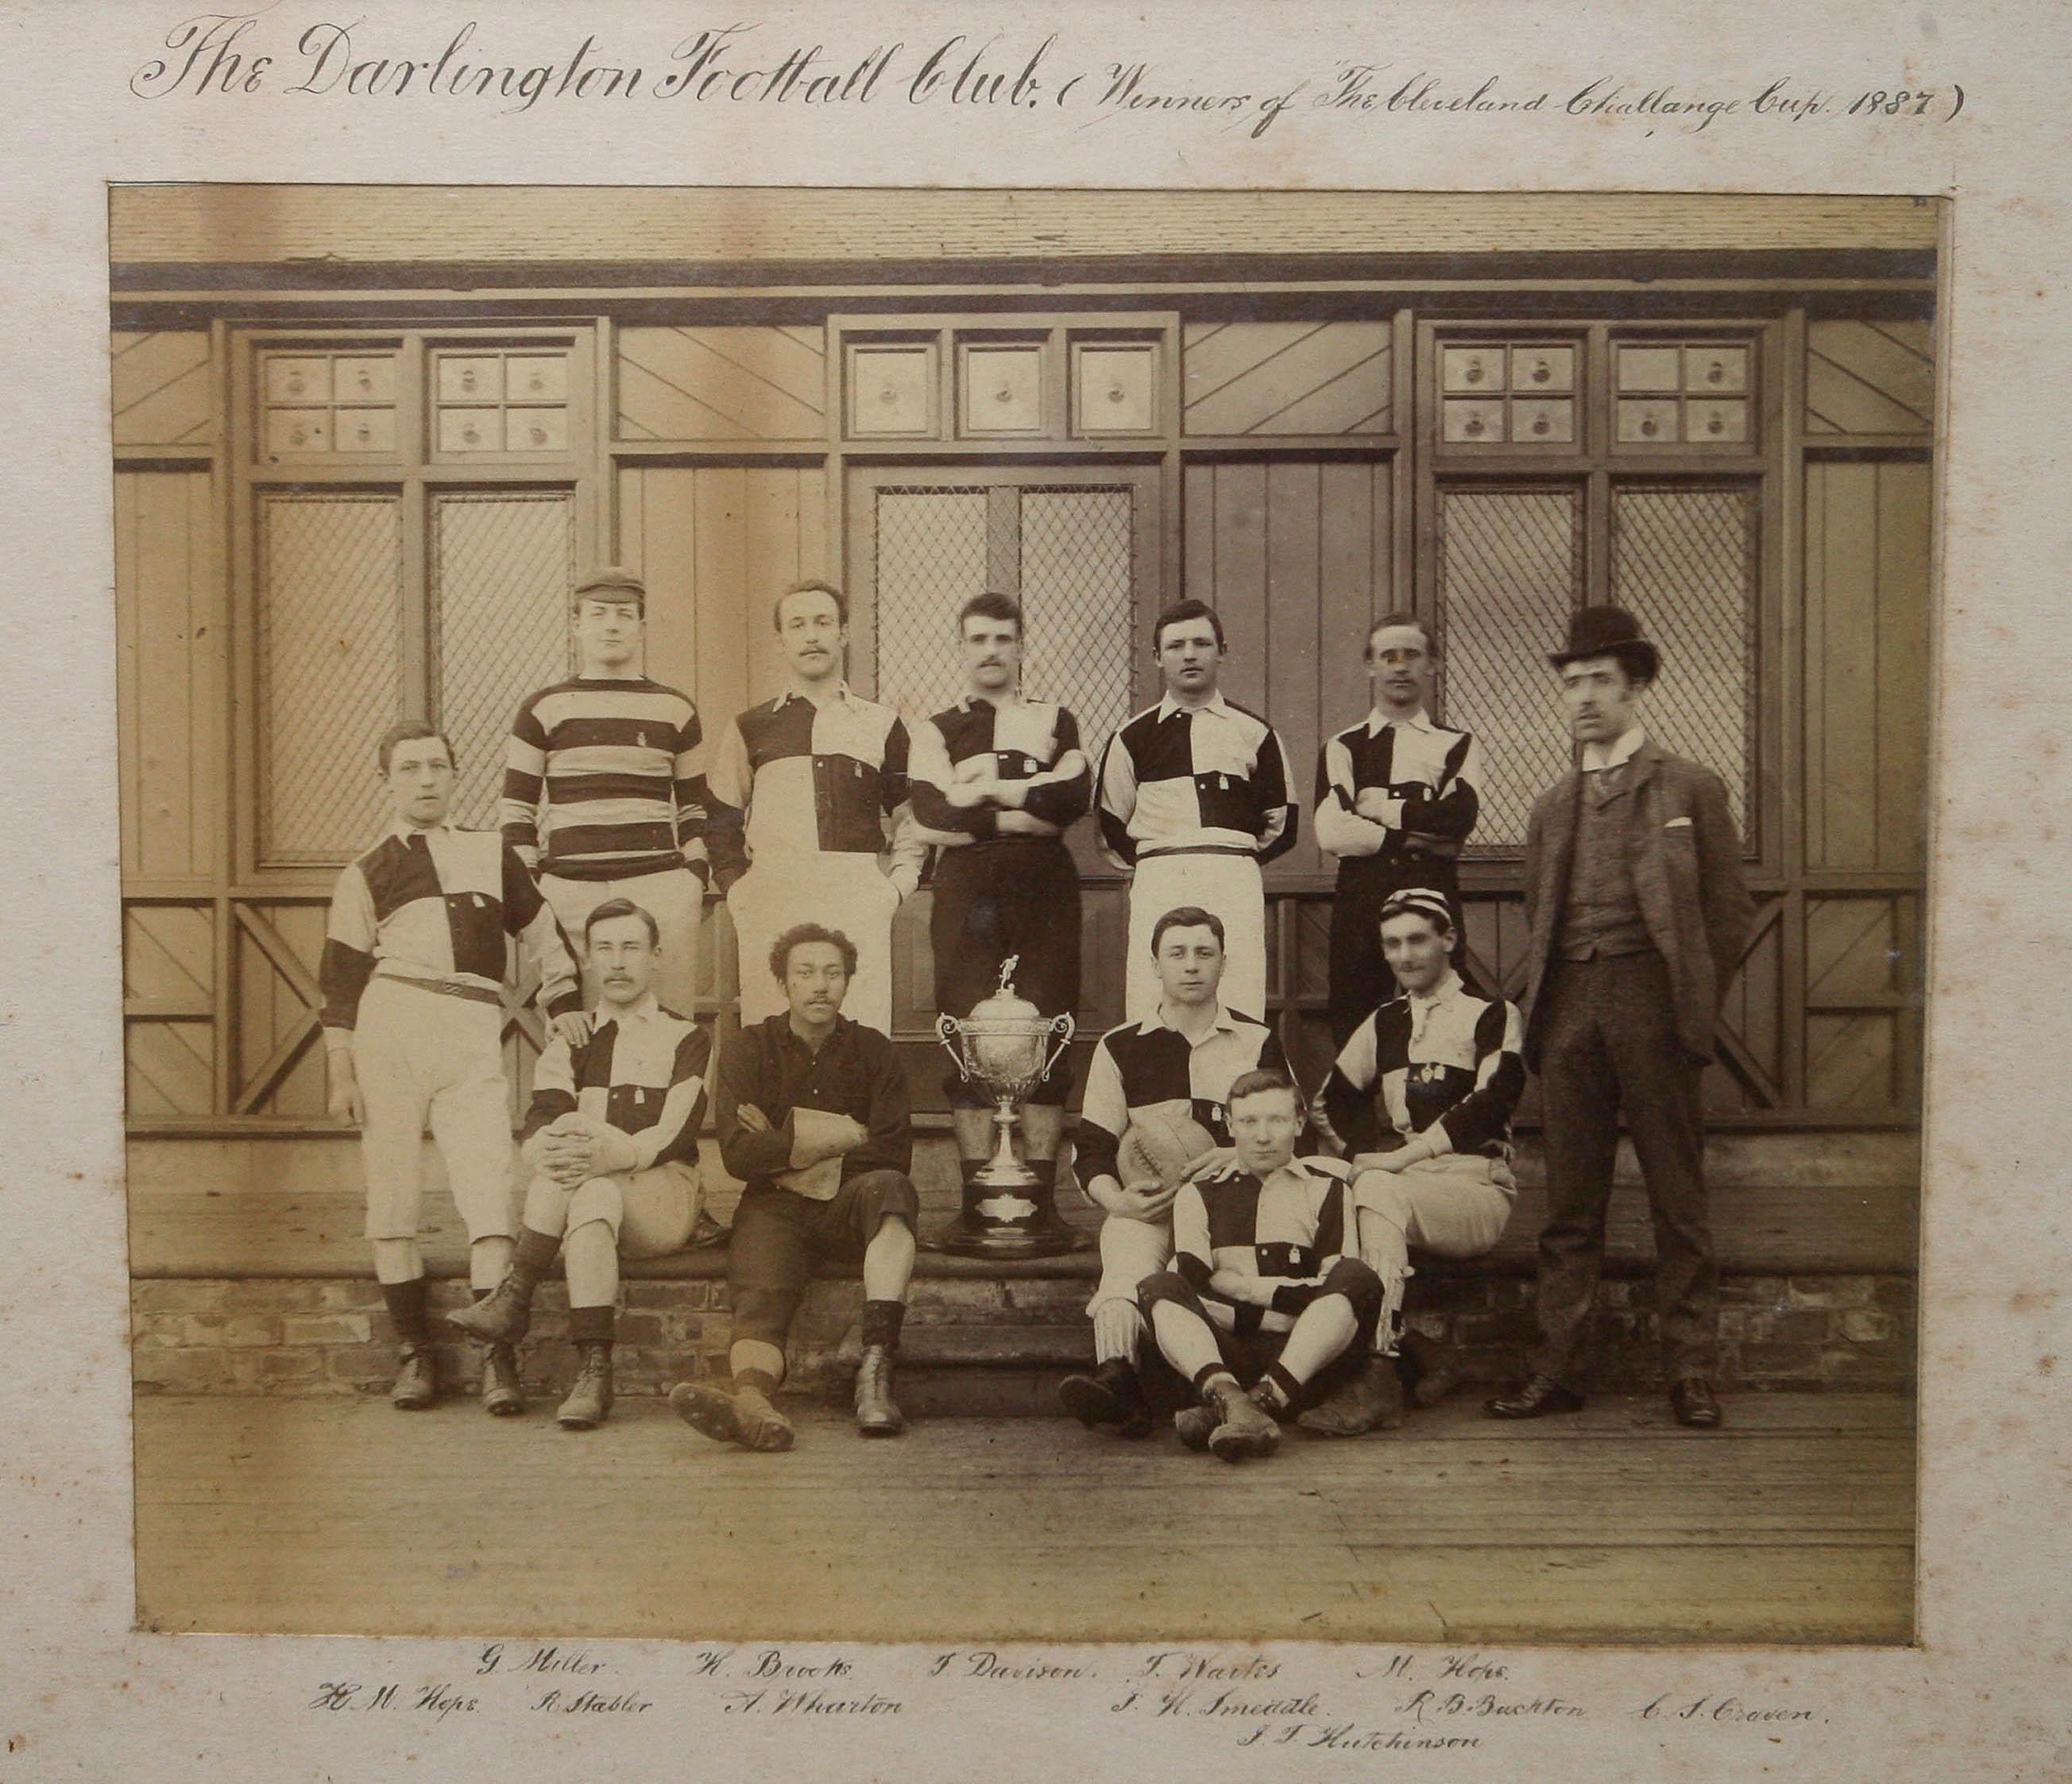 Darlington FC featuring Arthur Wharton